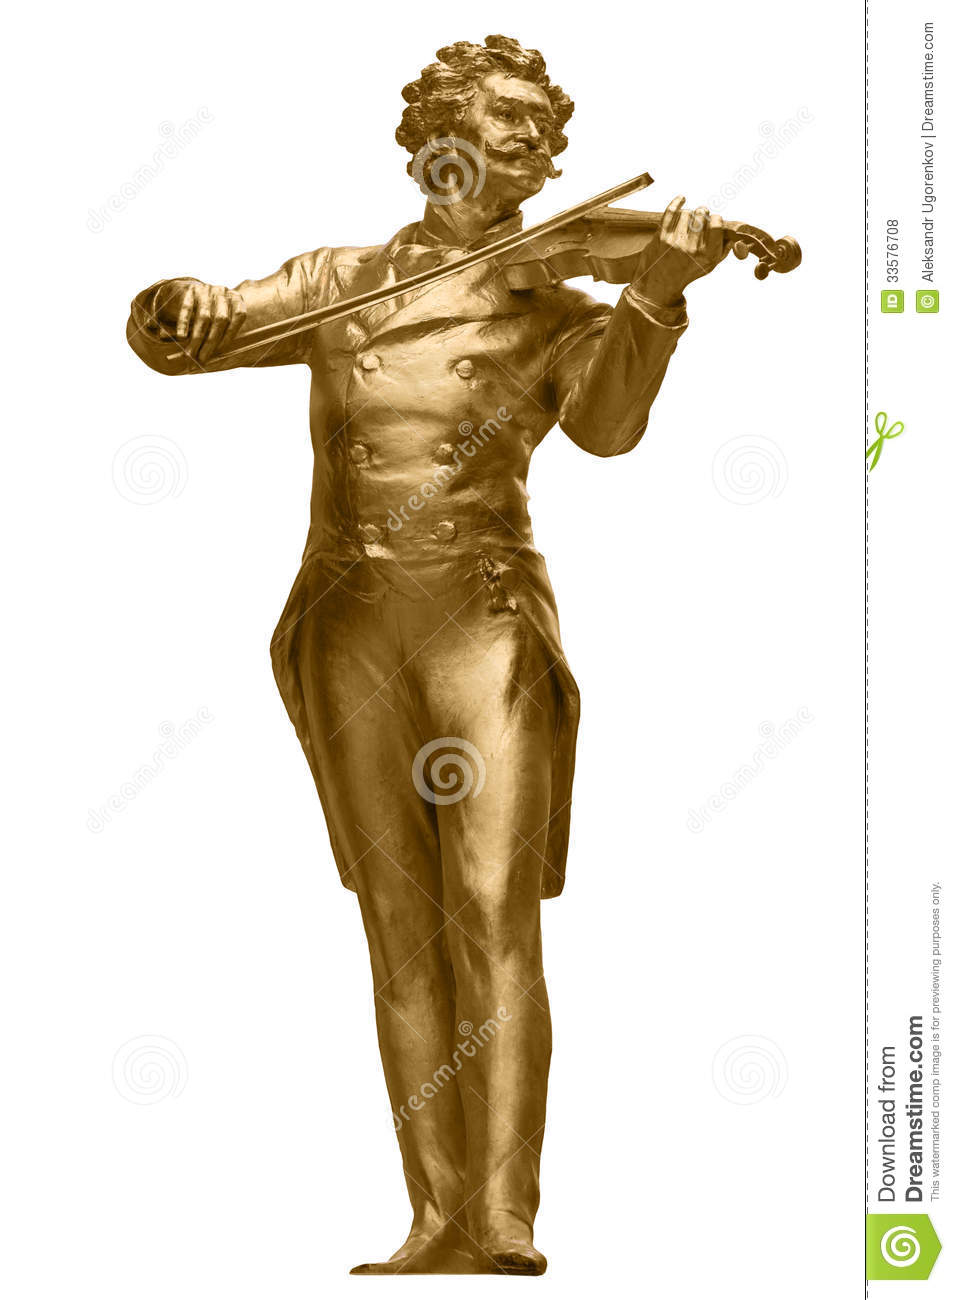 Johann Strauss Golden Statue On White Royalty Free Stock Photos.